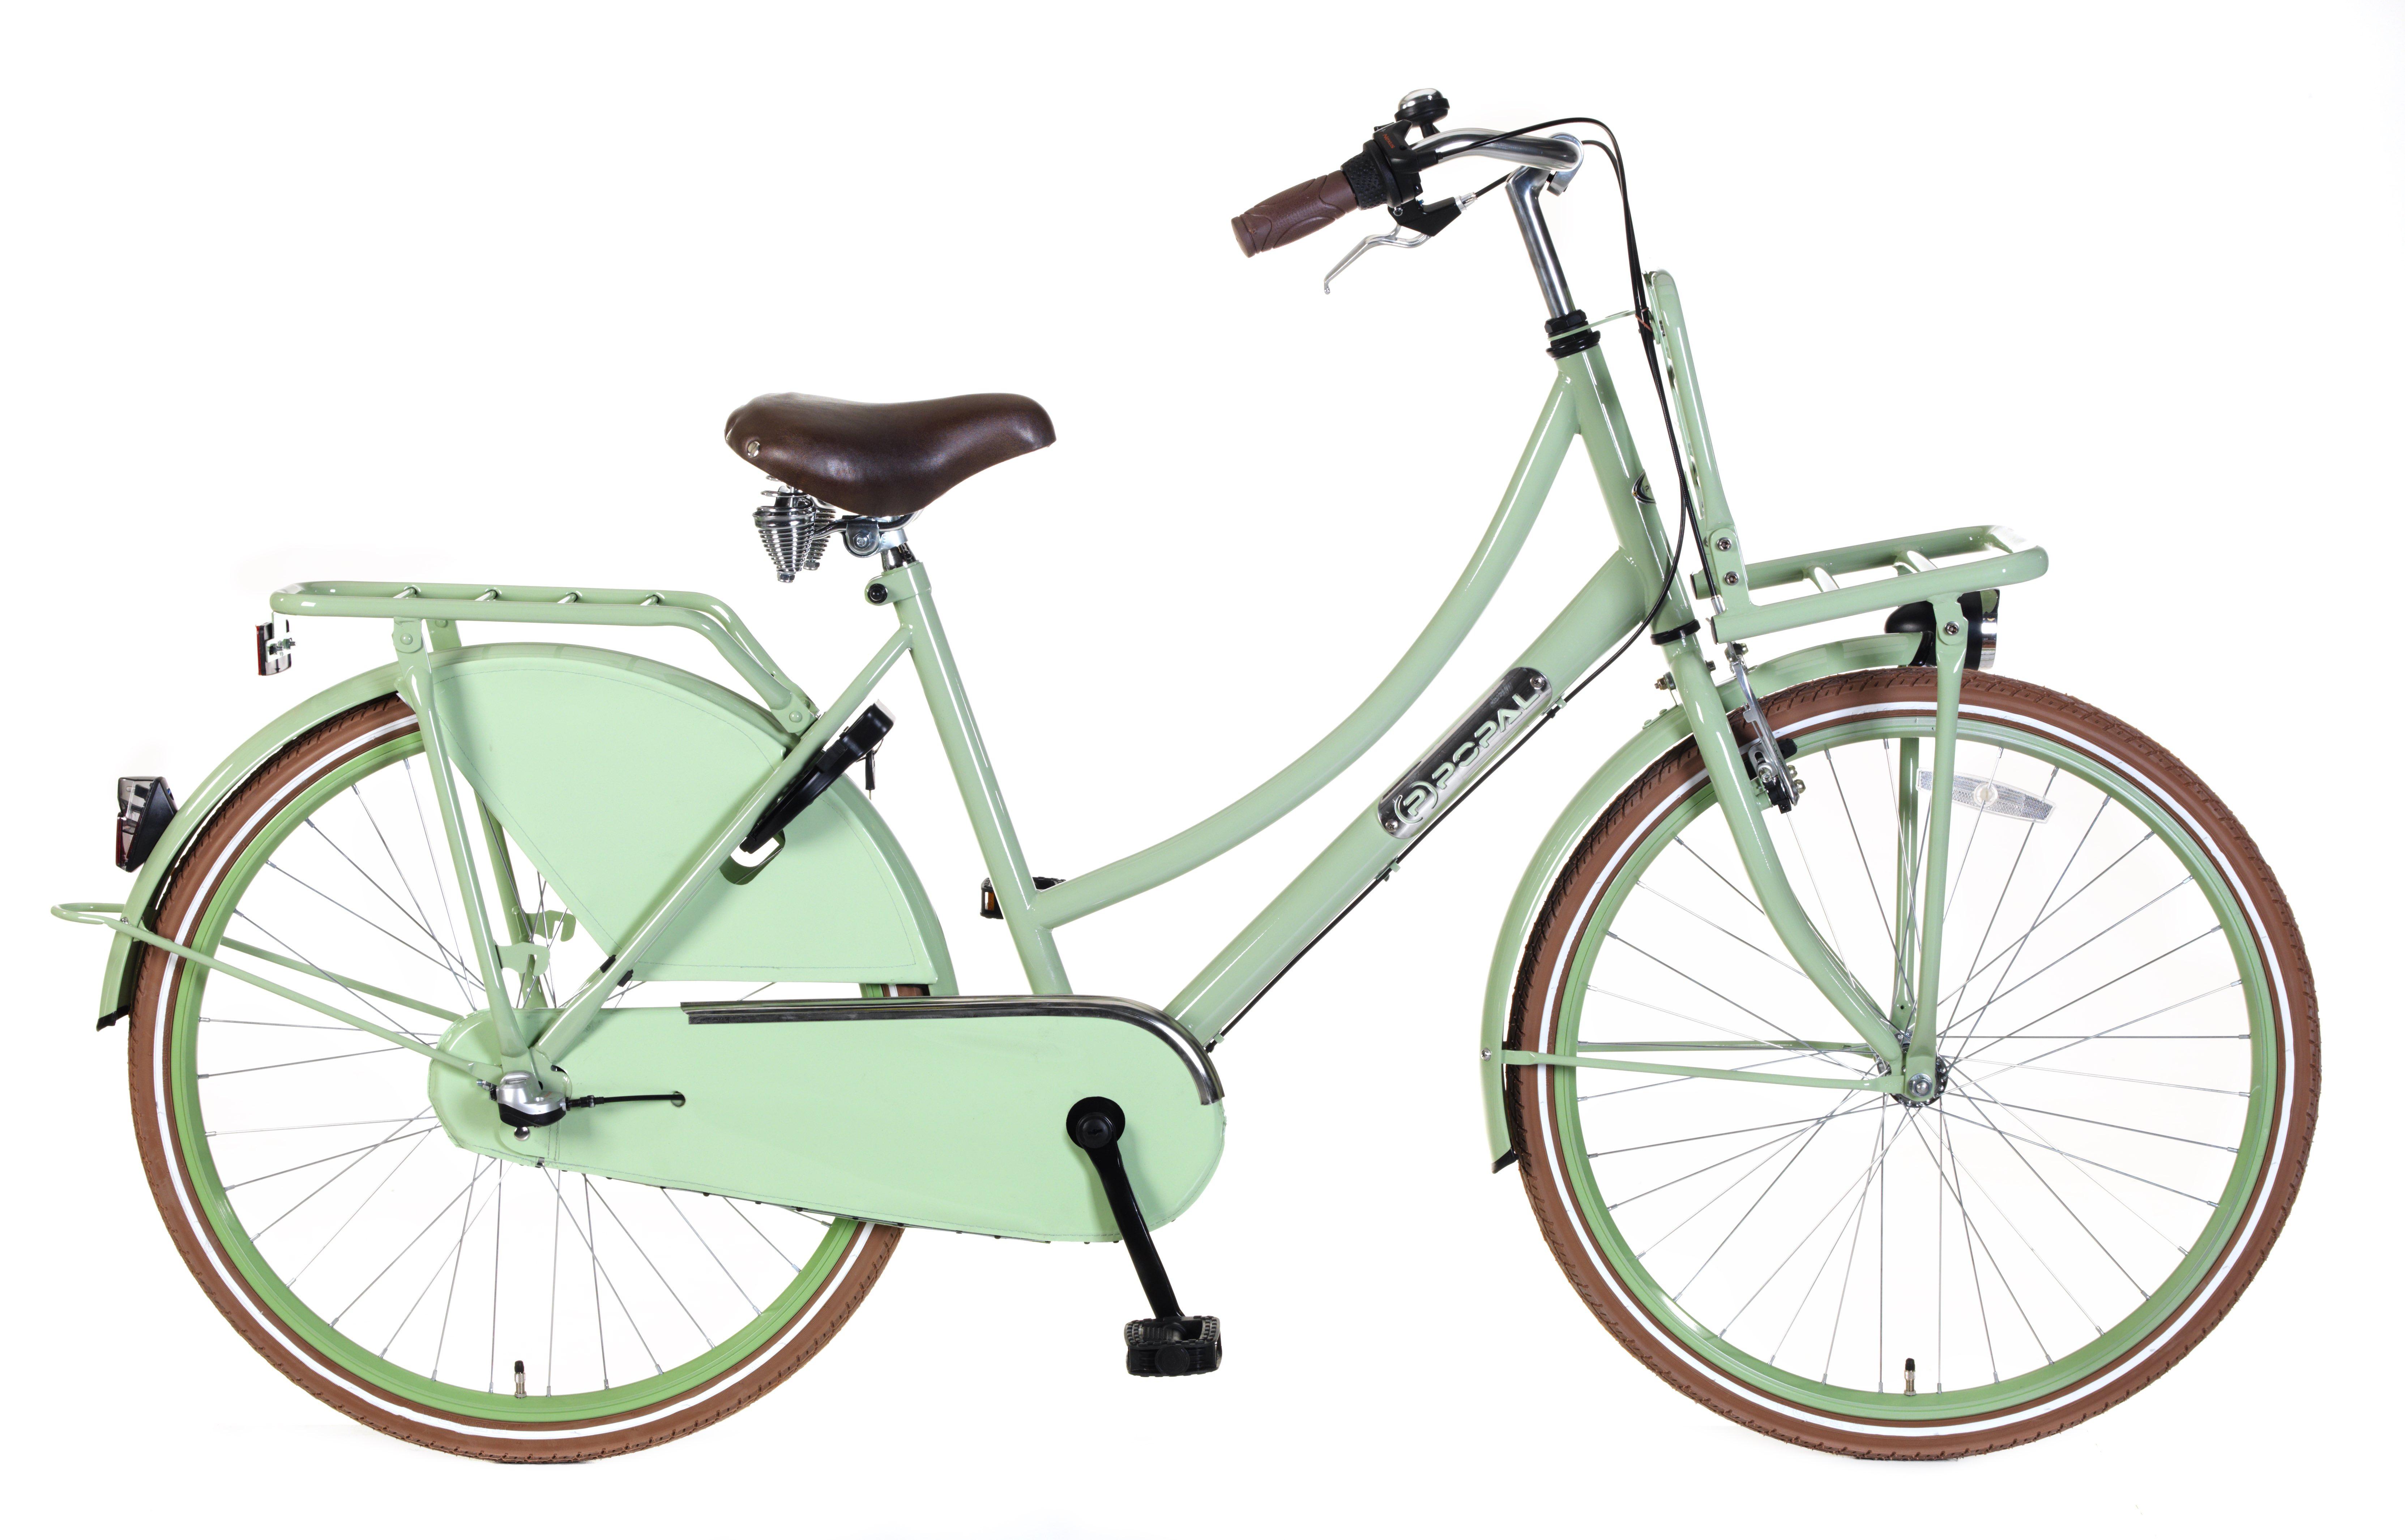 https://fietsenhalsteenwijk.files.wordpress.com/2019/05/pistache-transporter.jpg